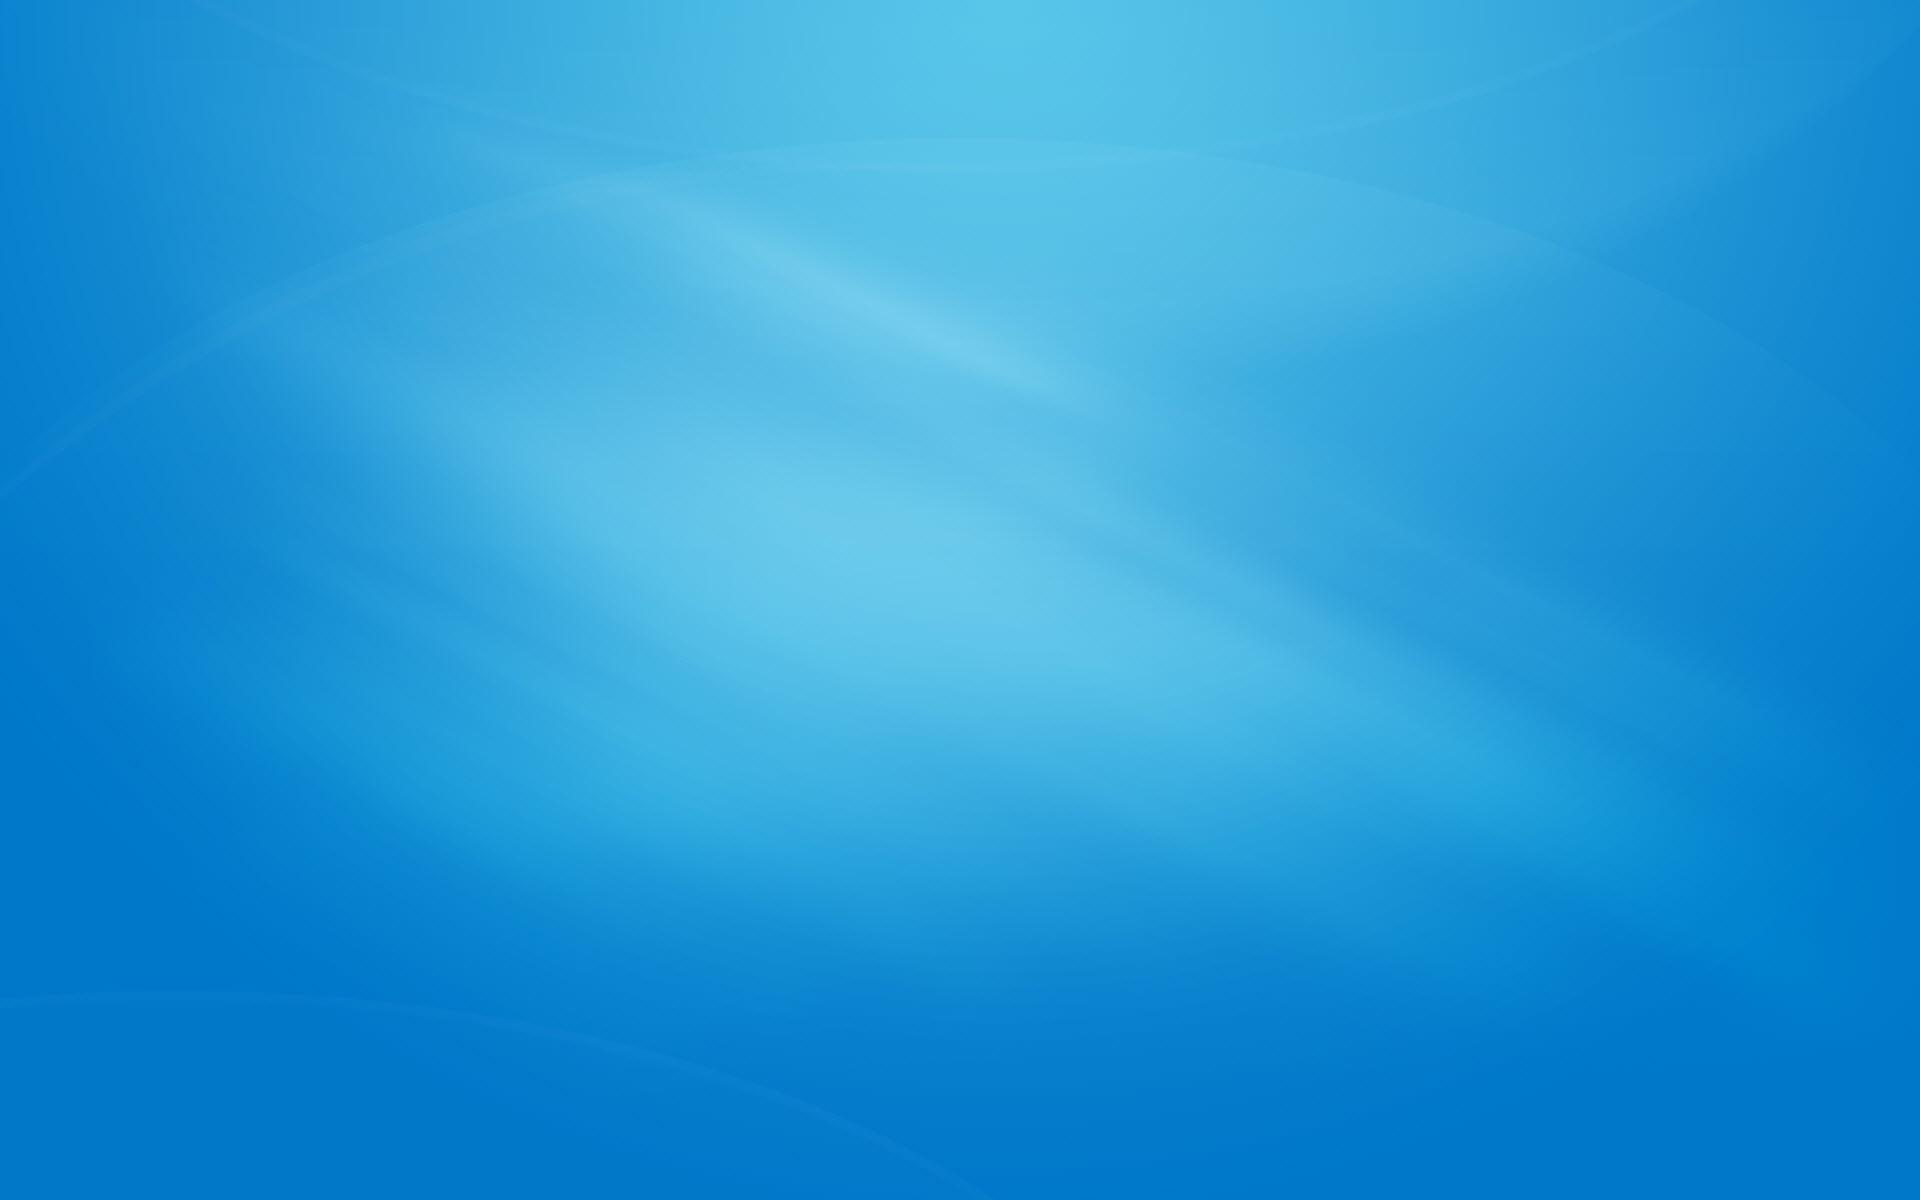 HD Desktop Blue Wallpapers | HD Wallpapers